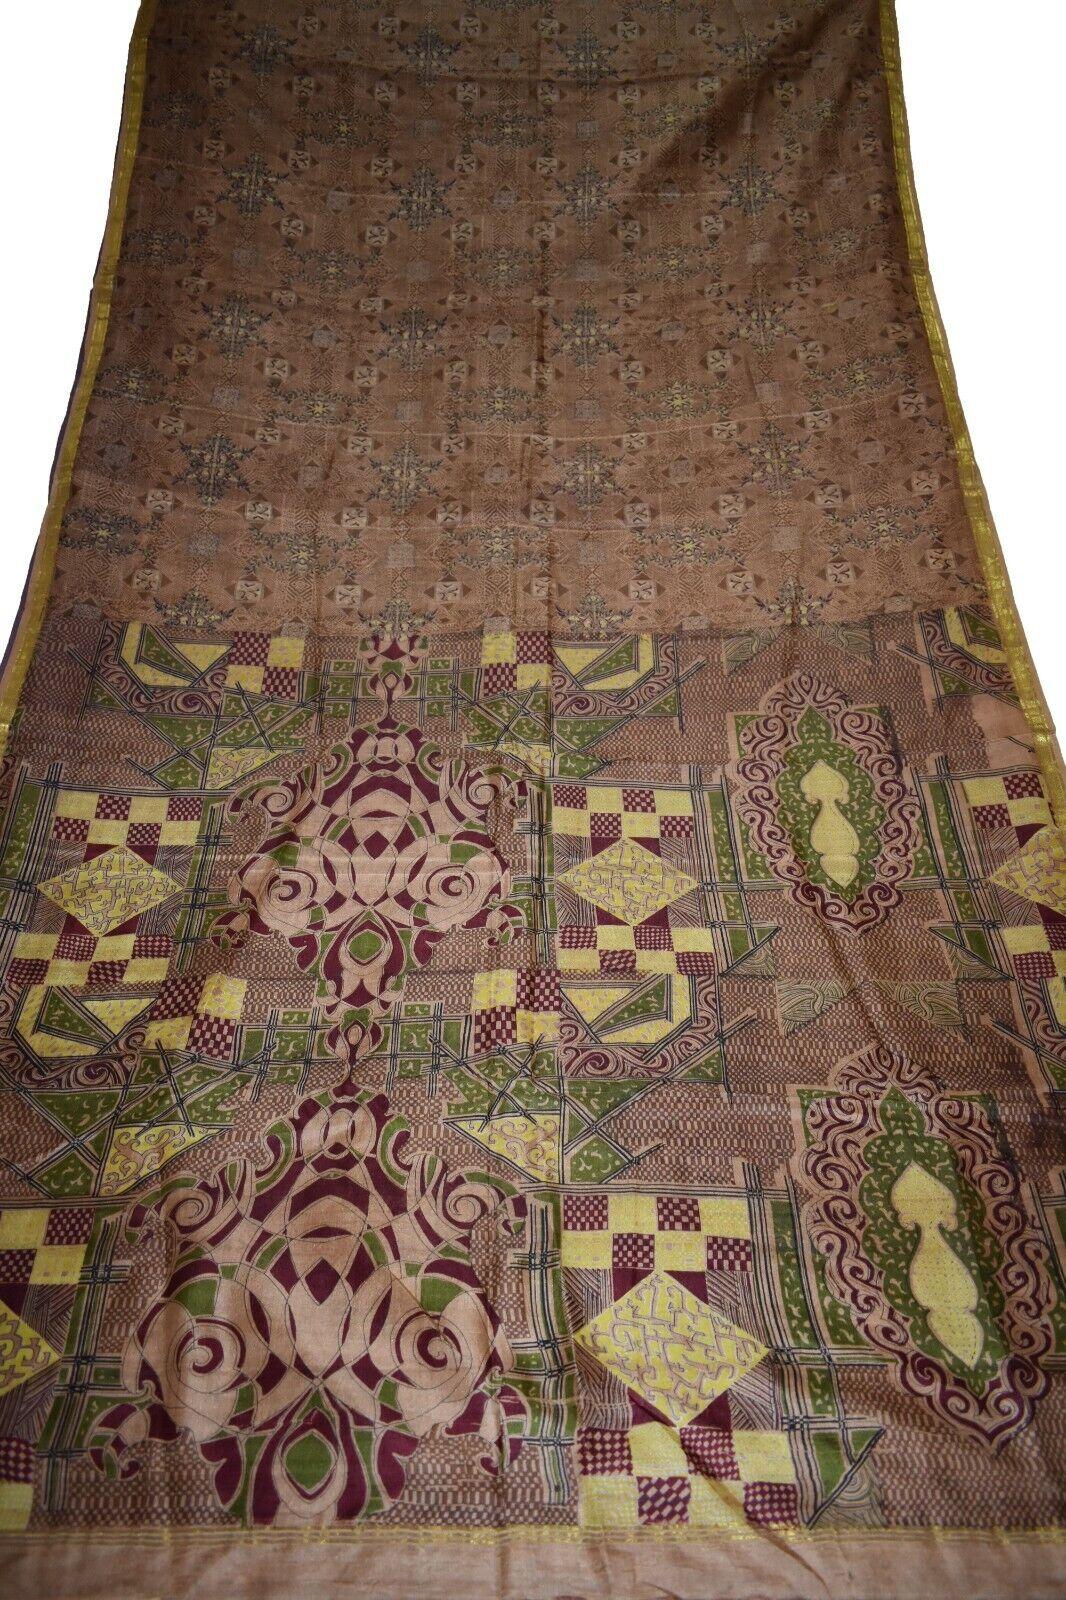 Vintage Printed Saree Brown100% Pure Silk Floral Print Sari Design Craft IPR3365